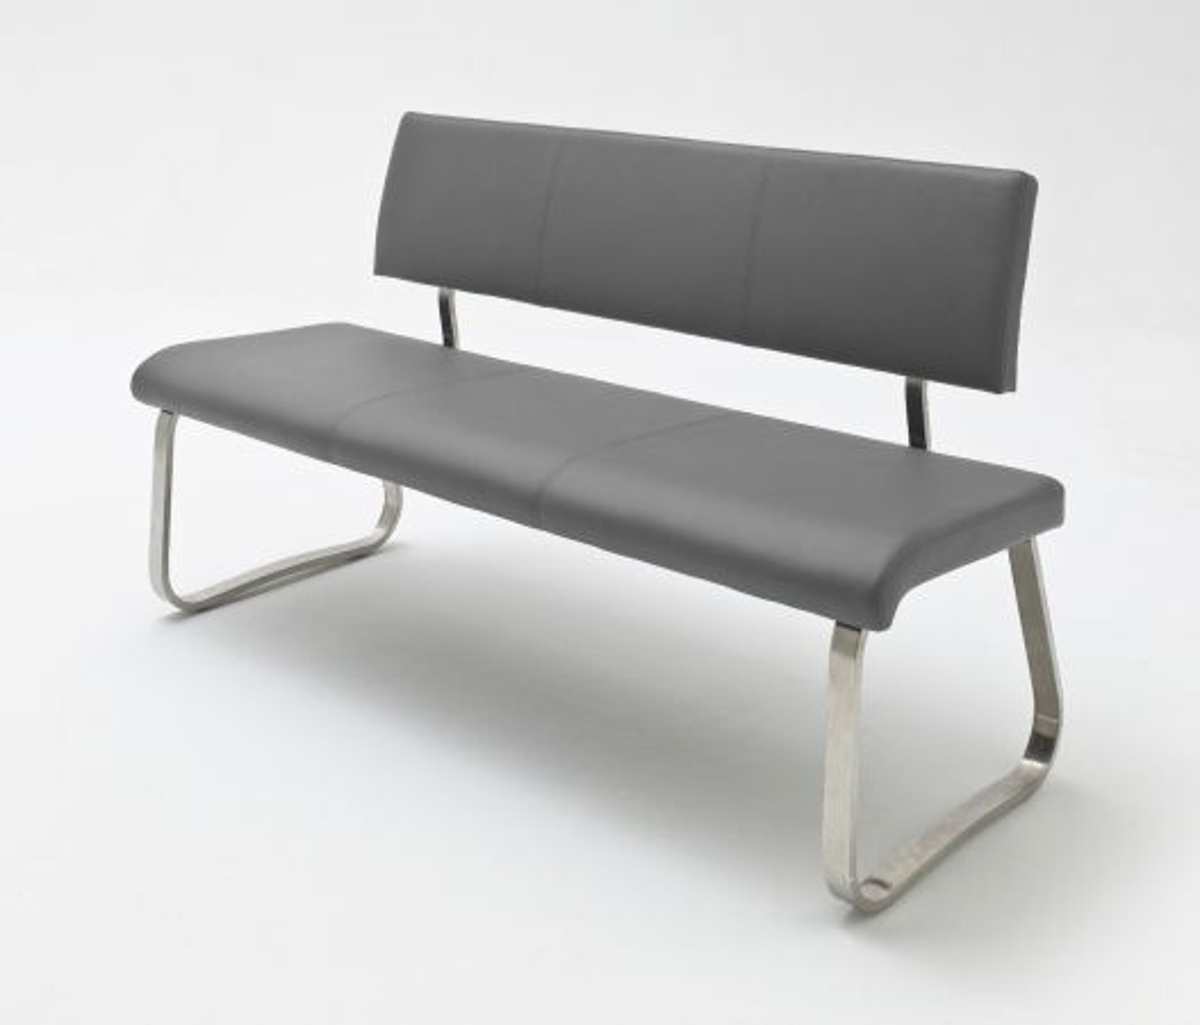 Sitzbank Arco Grau Leder 155 cm